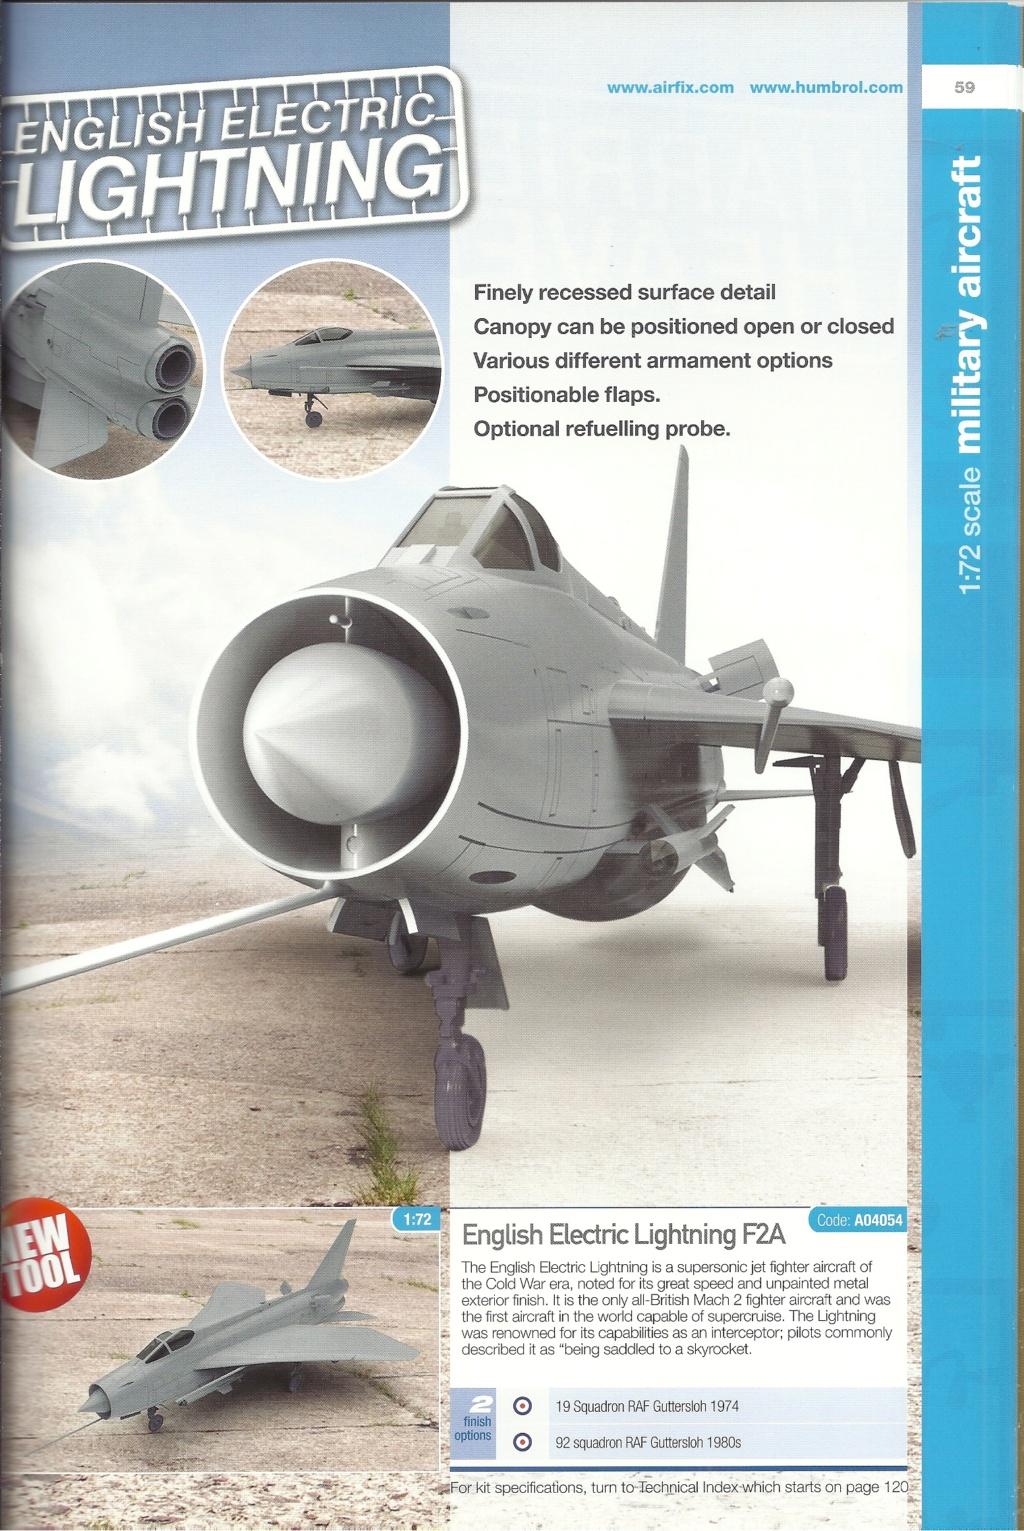 [AIRFIX 2013] Catalogue 2013 Airf1573